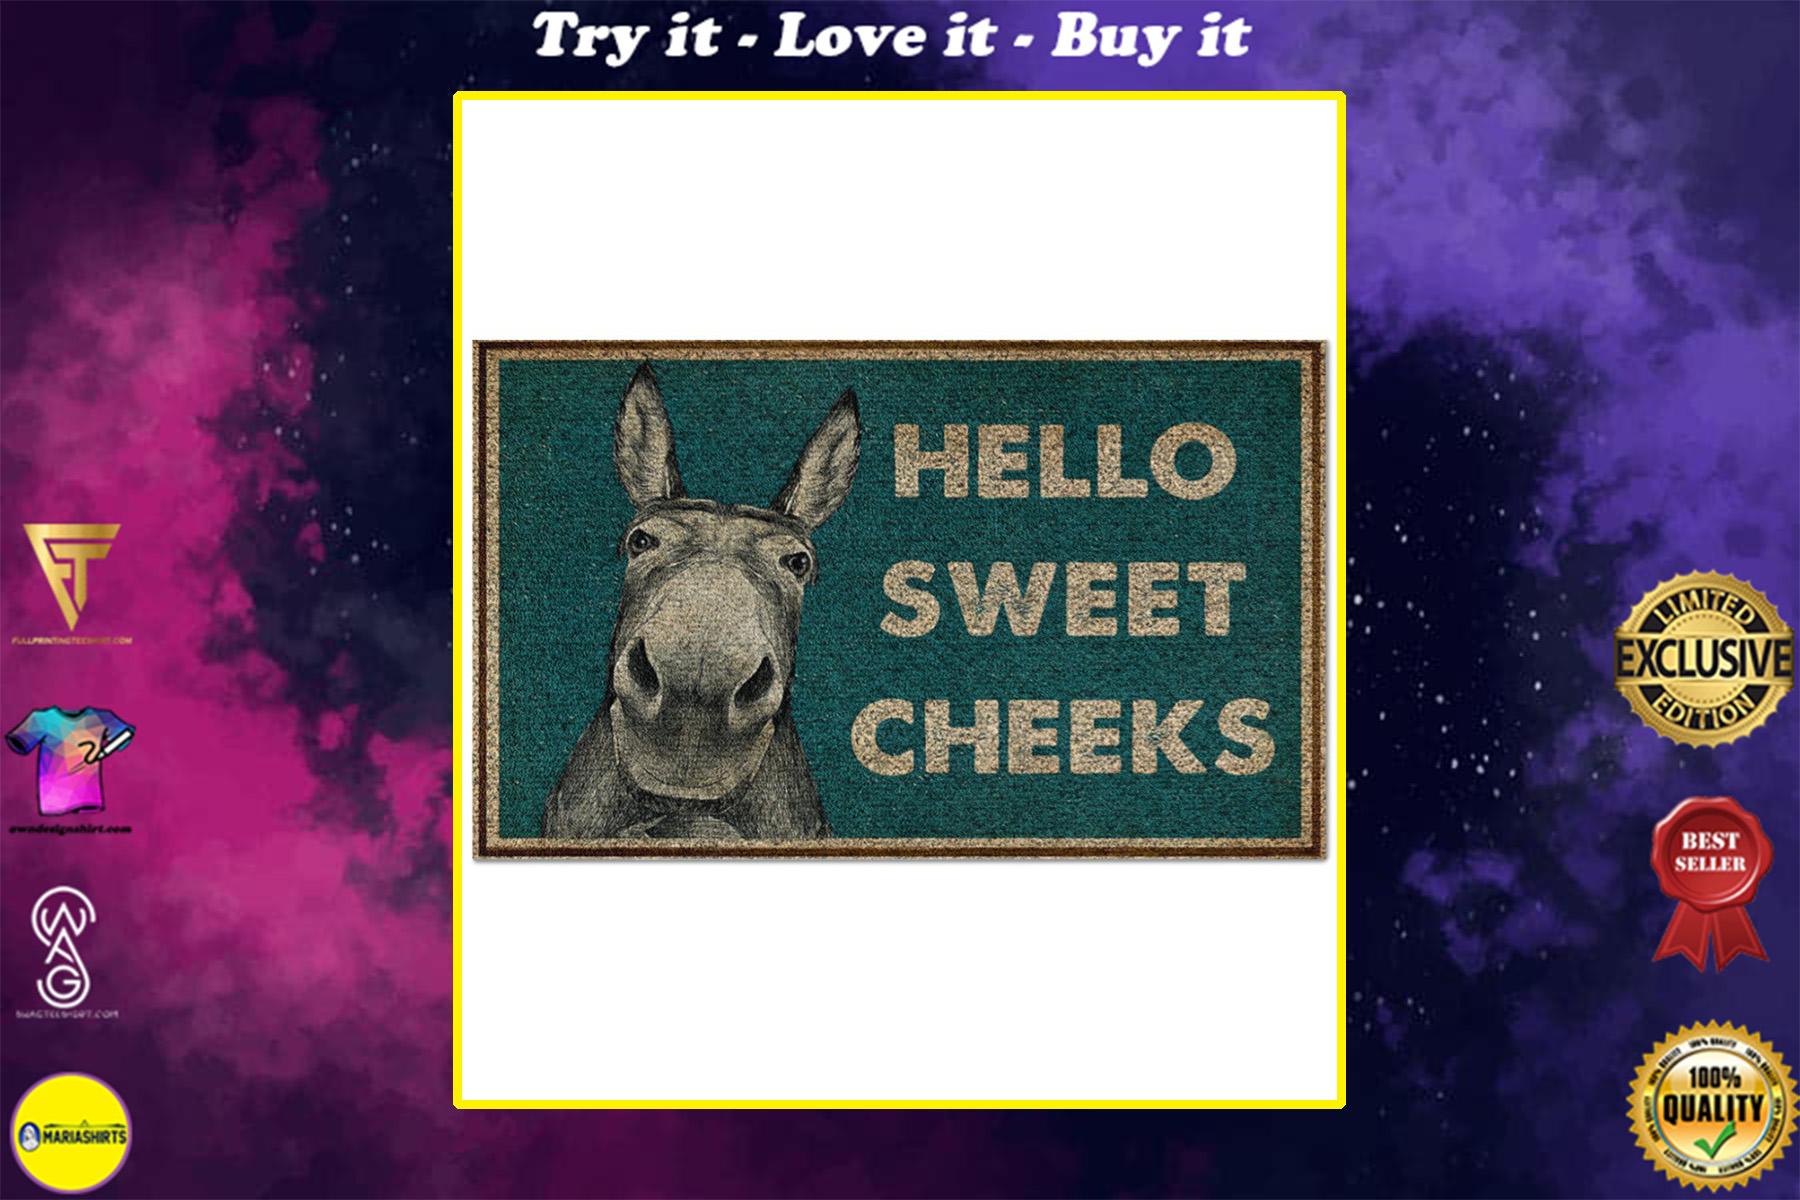 donkey hello sweet cheeks full printing doormat